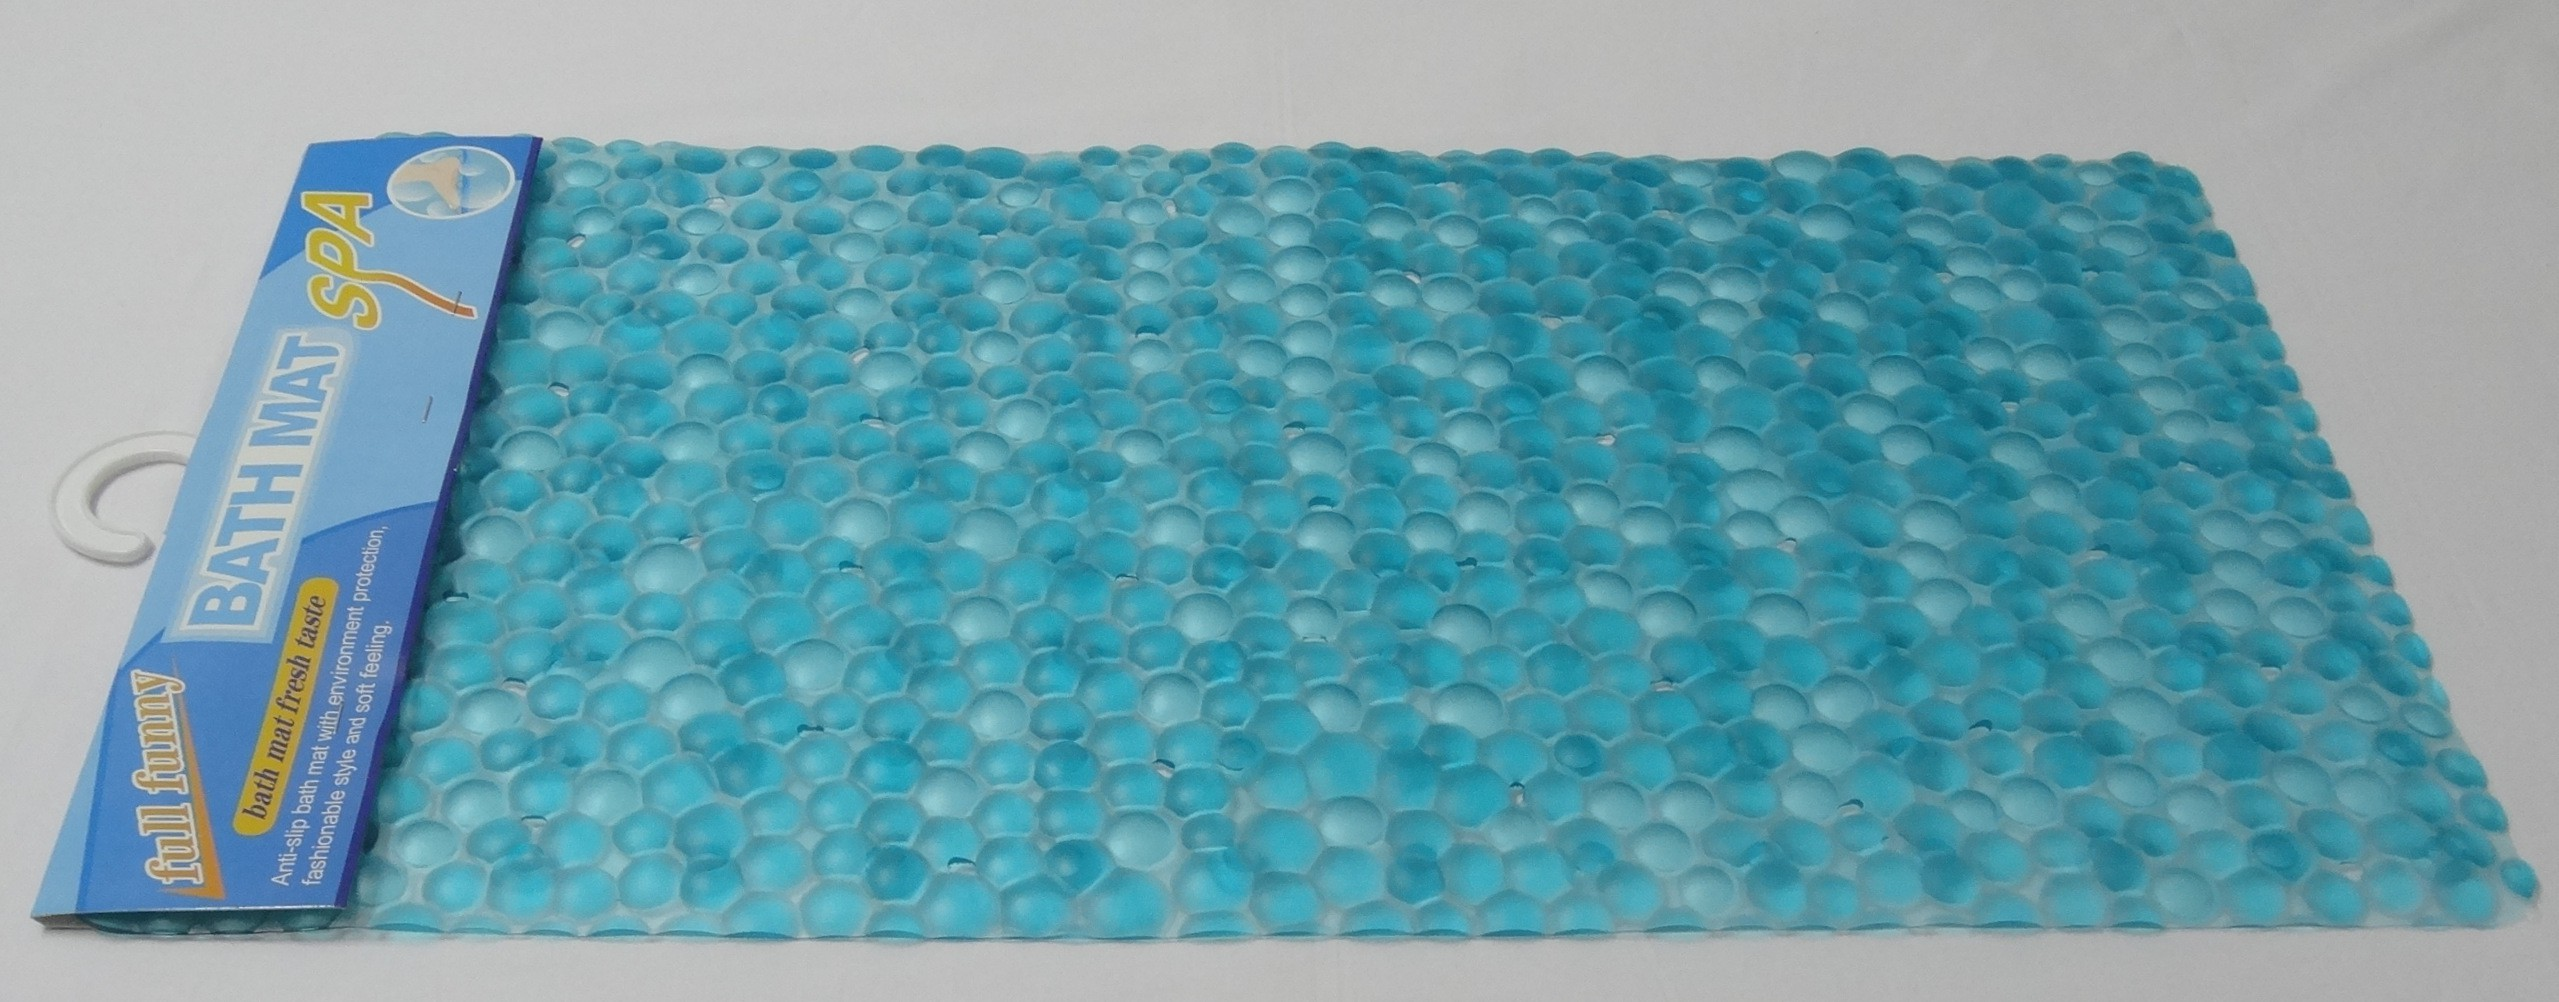 Decorika PVC Medium Bath Mat Bath Mat class=